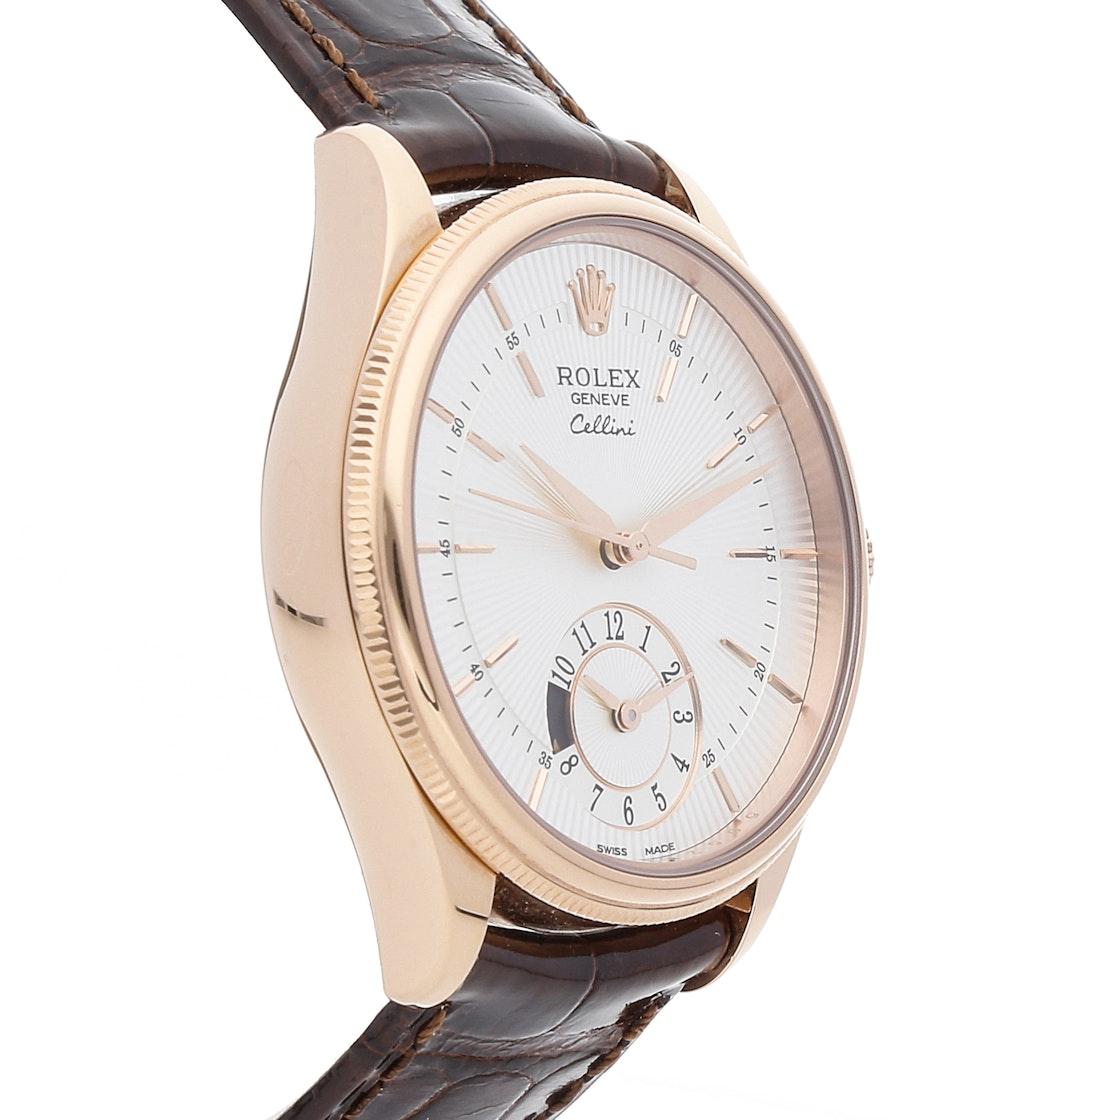 Rolex Cellini Dual Time 50525